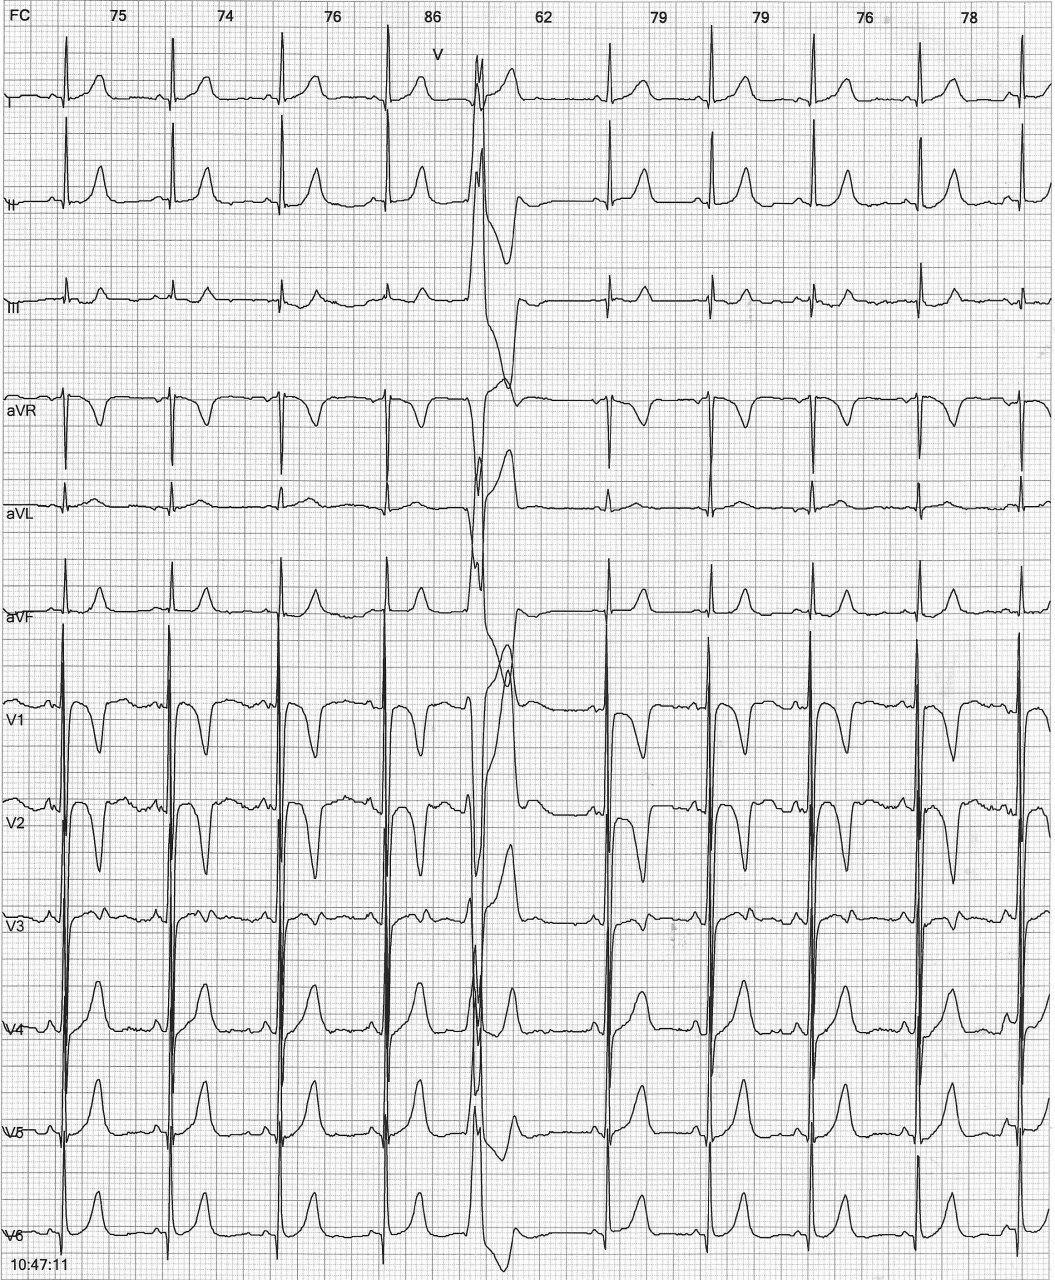 Niño de 5 años con ecocardiograma normal que presenta EVs frecuentes por probable DAVD